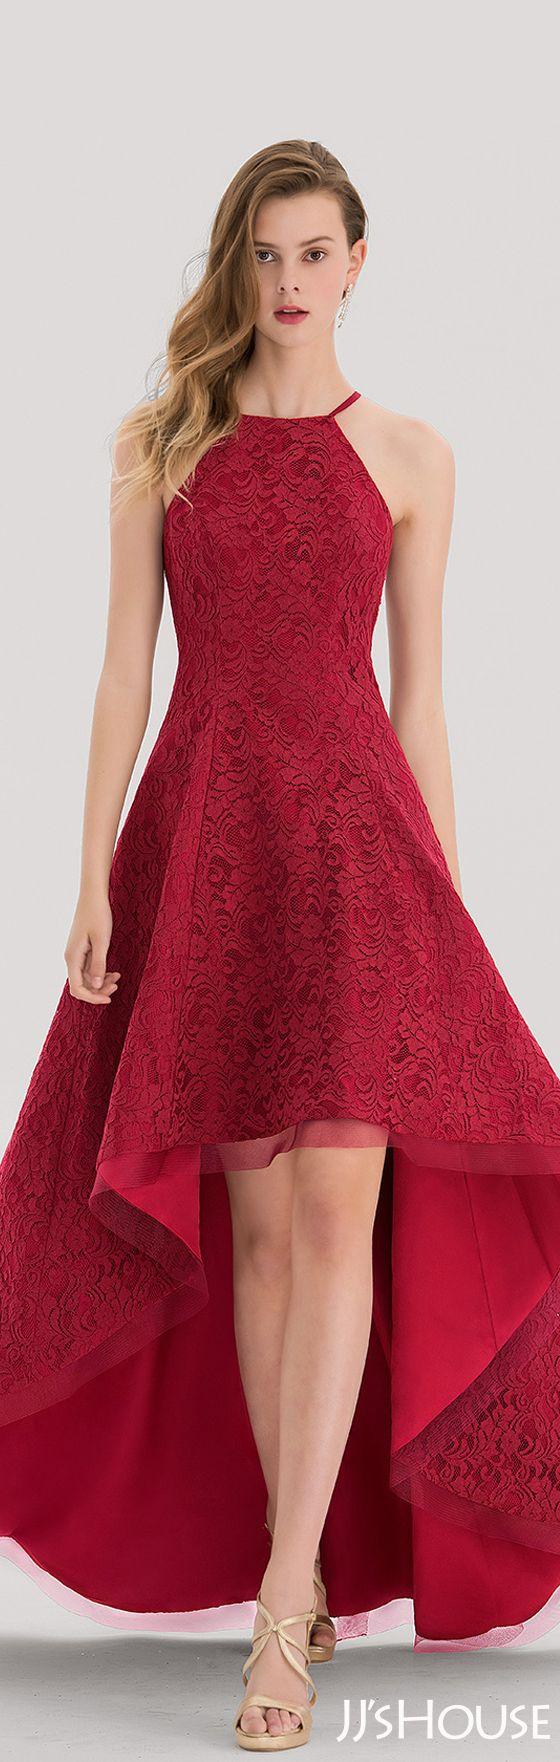 A-Line/Princess Square Neckline Asymmetrical Lace Prom Dress#JJsHouse #Prom dresses